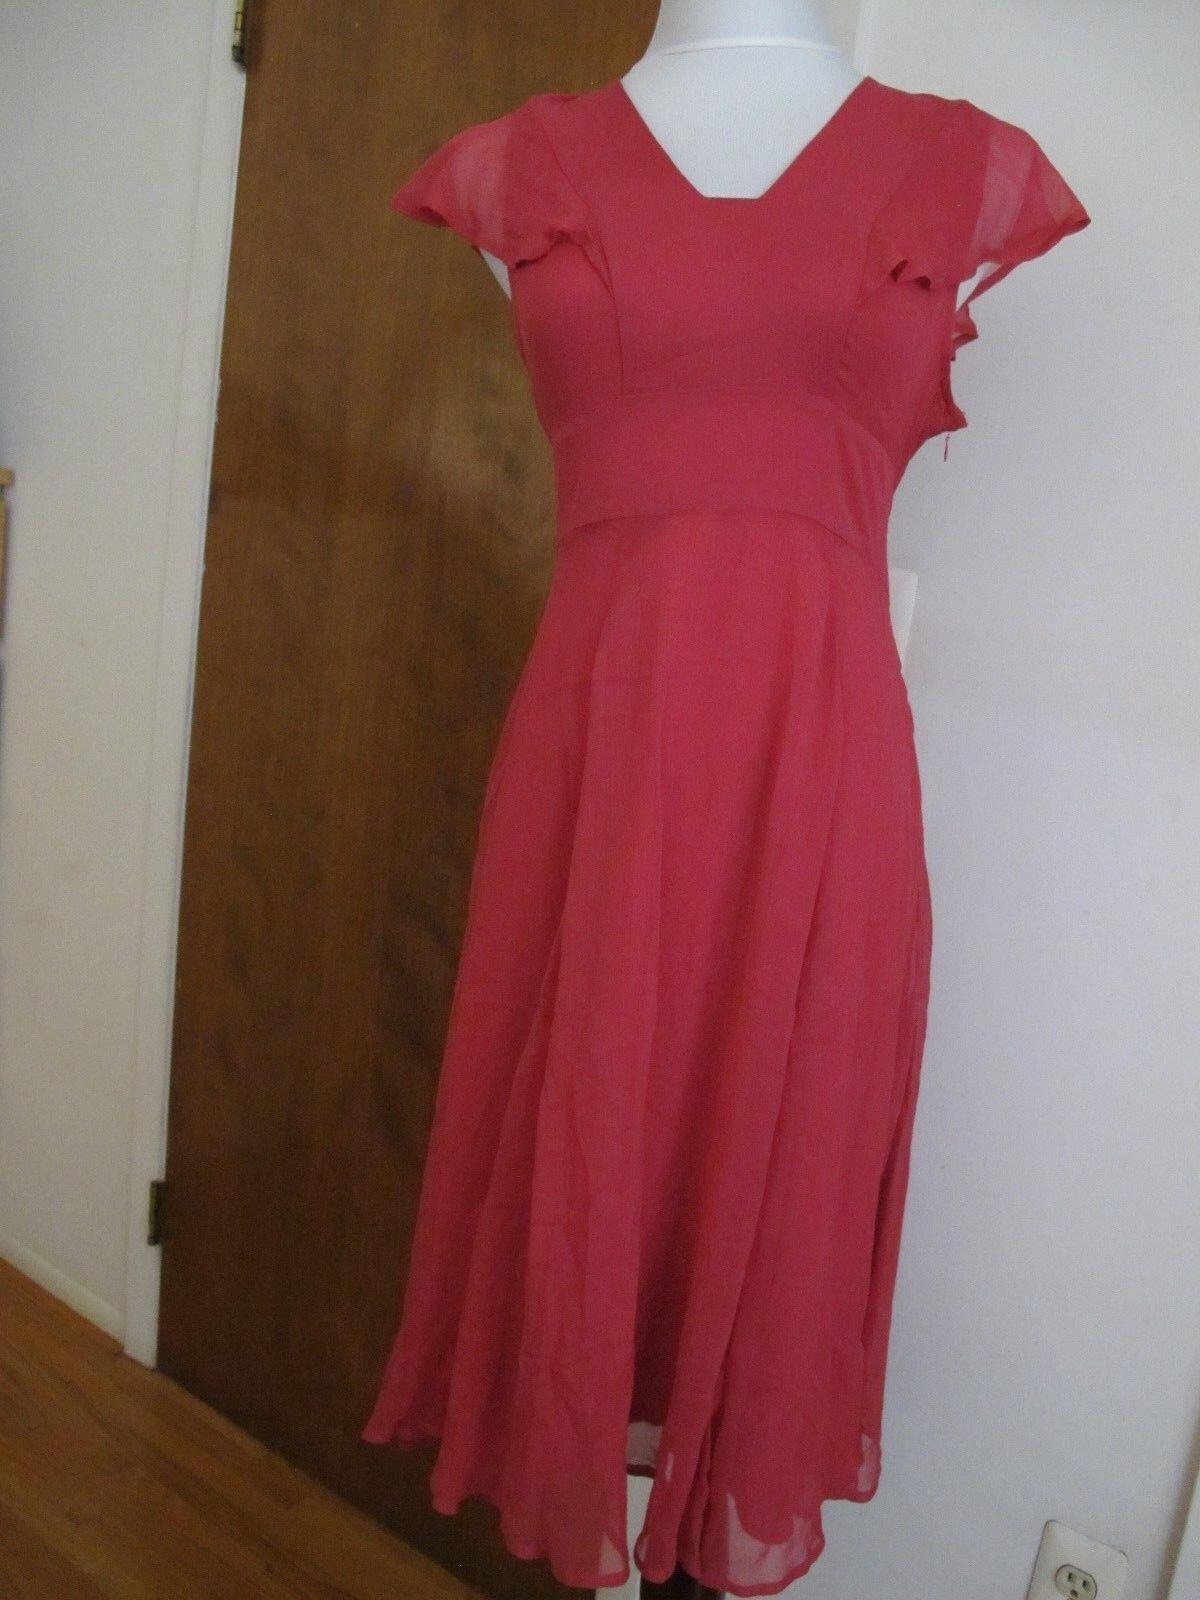 Anthropologie HD in Paris damen Rosa Rosa Silk Dress Größe 4